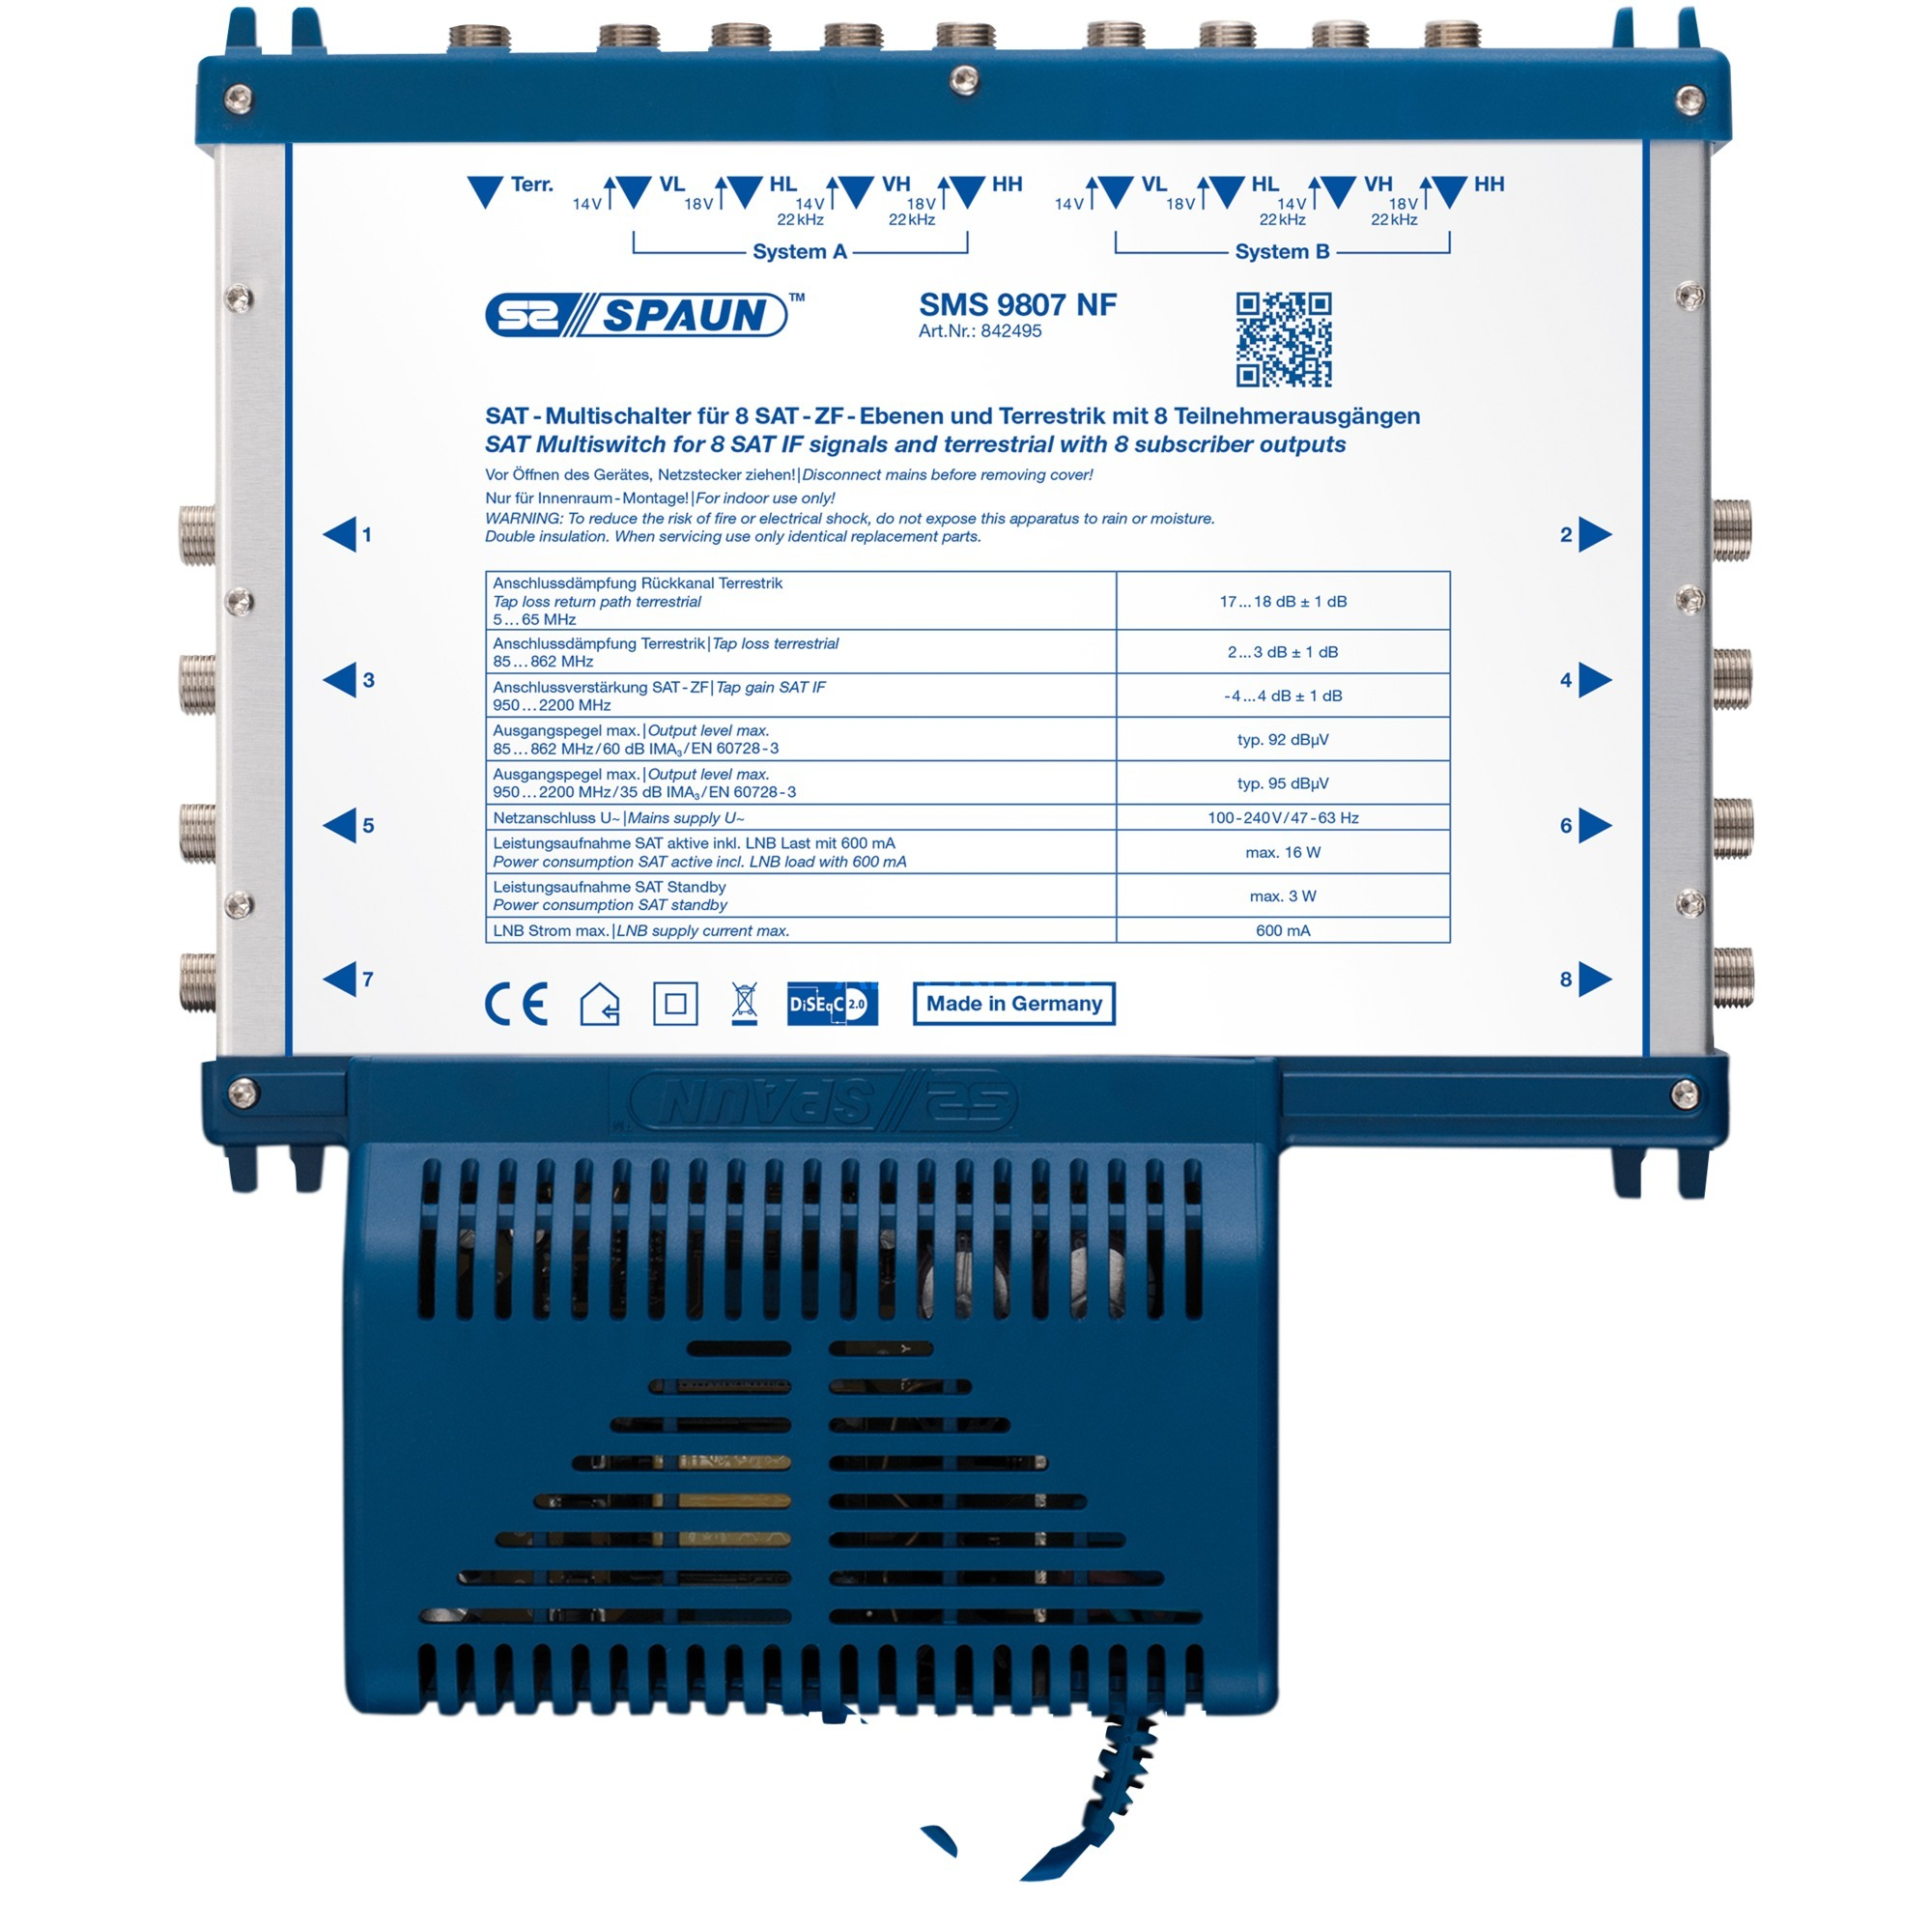 SMS 9807 NF interruptor de video, Interruptor múltiple